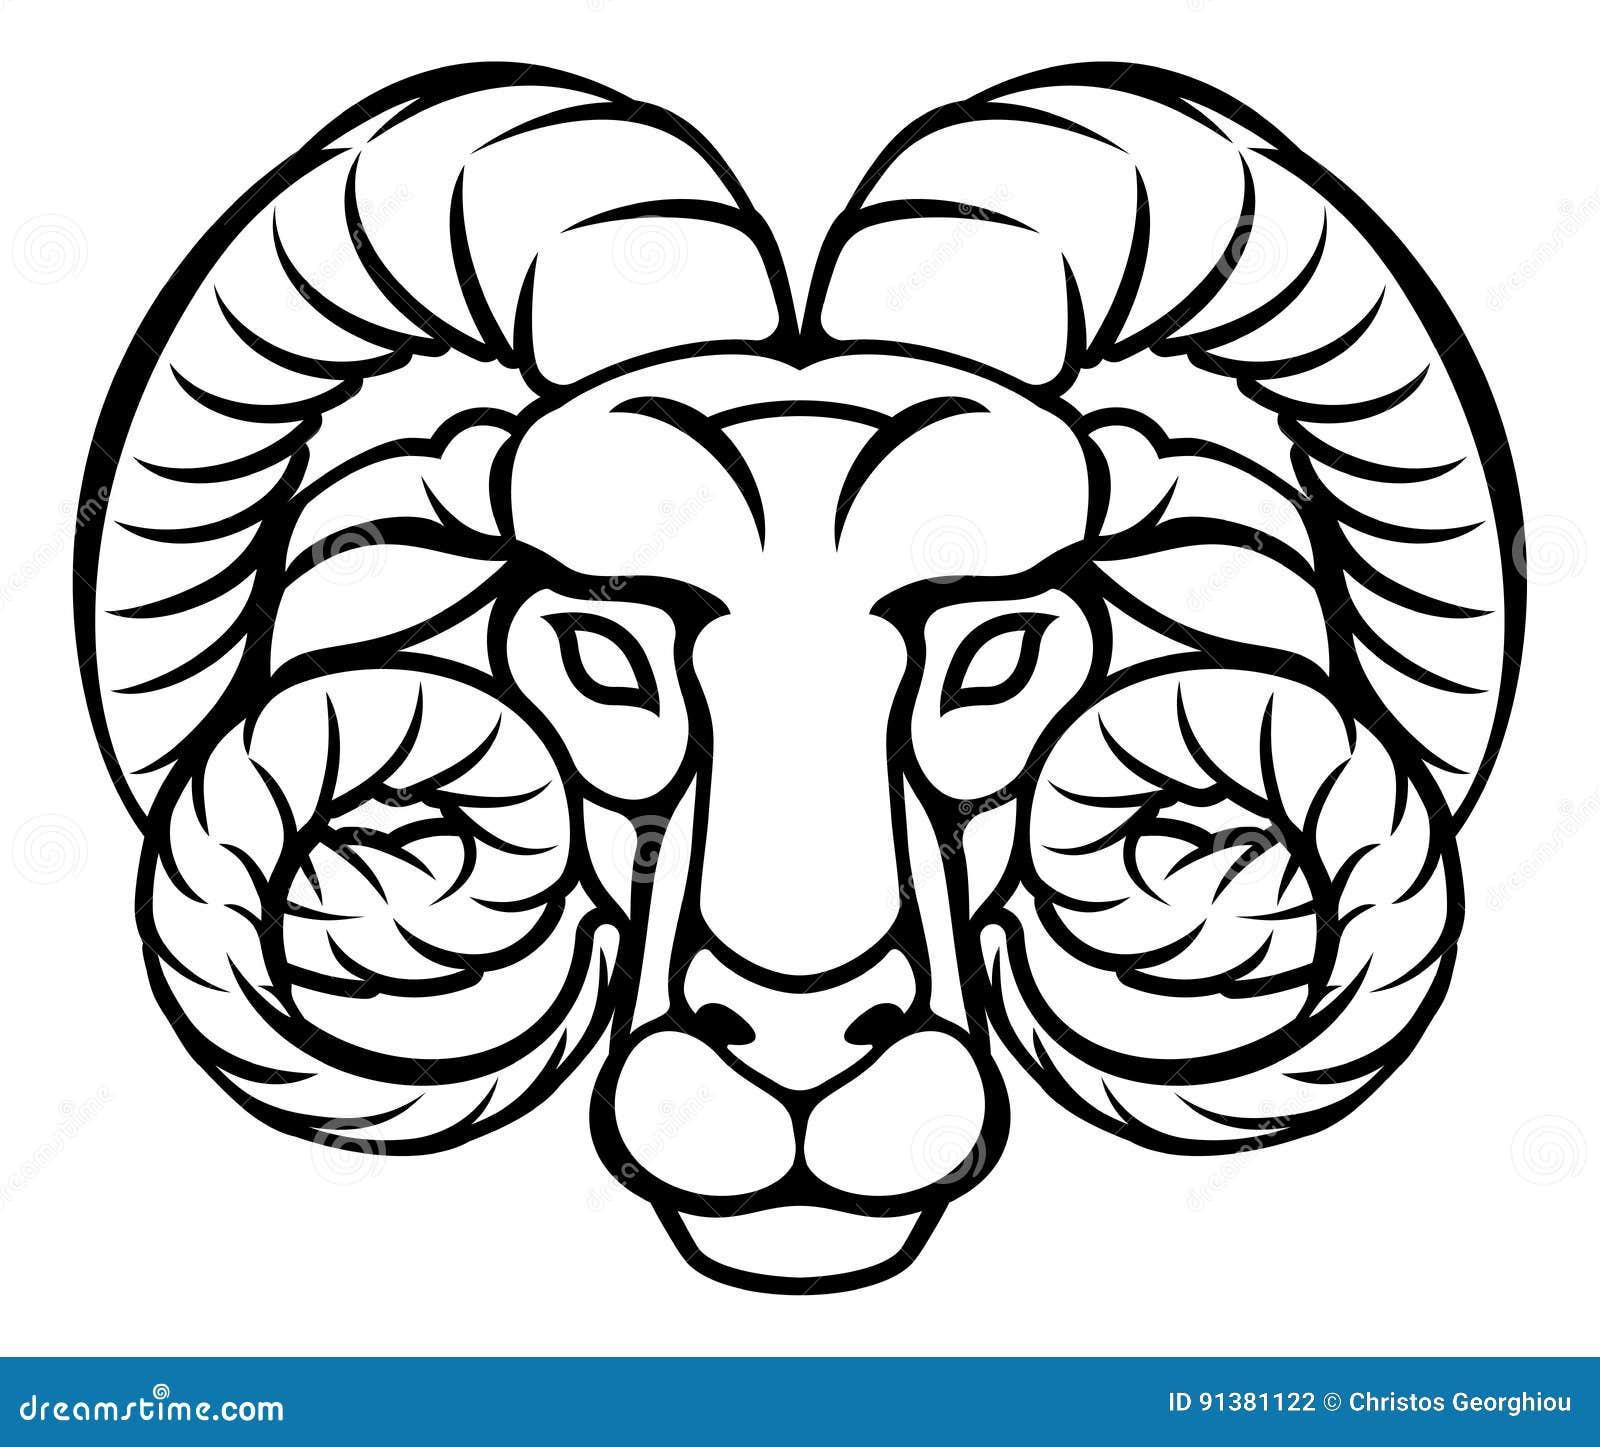 Aries Zodiac Sign Ram Stock Vector Illustration Of Icon 91381122